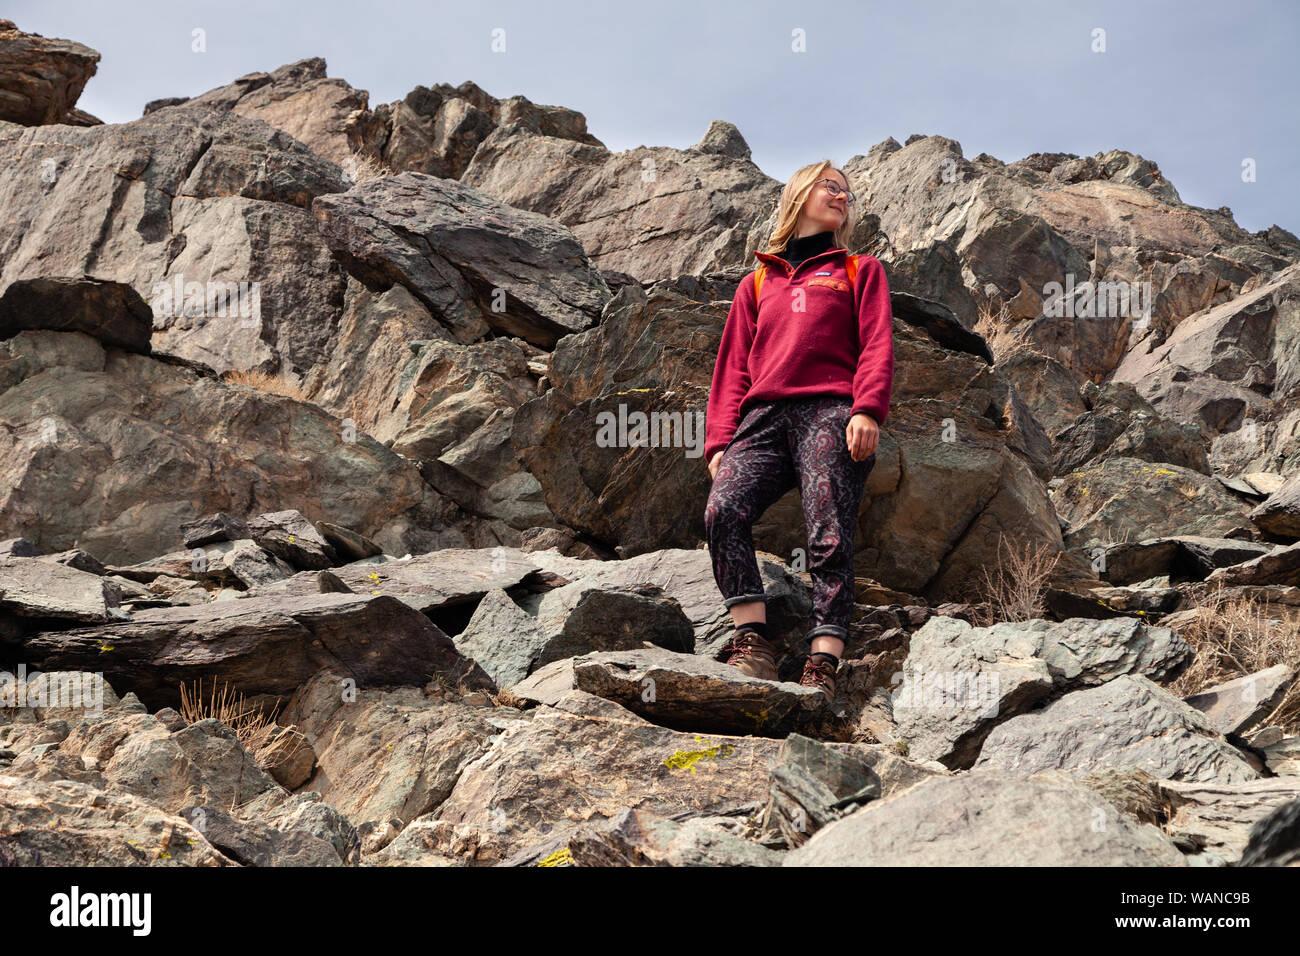 Mongolia Ulgii 2019-05-04 European scandinavian blonde girl in glasses with backpack do hiking, mountain climbing, walking, hiking. Freedom concept, t Stock Photo